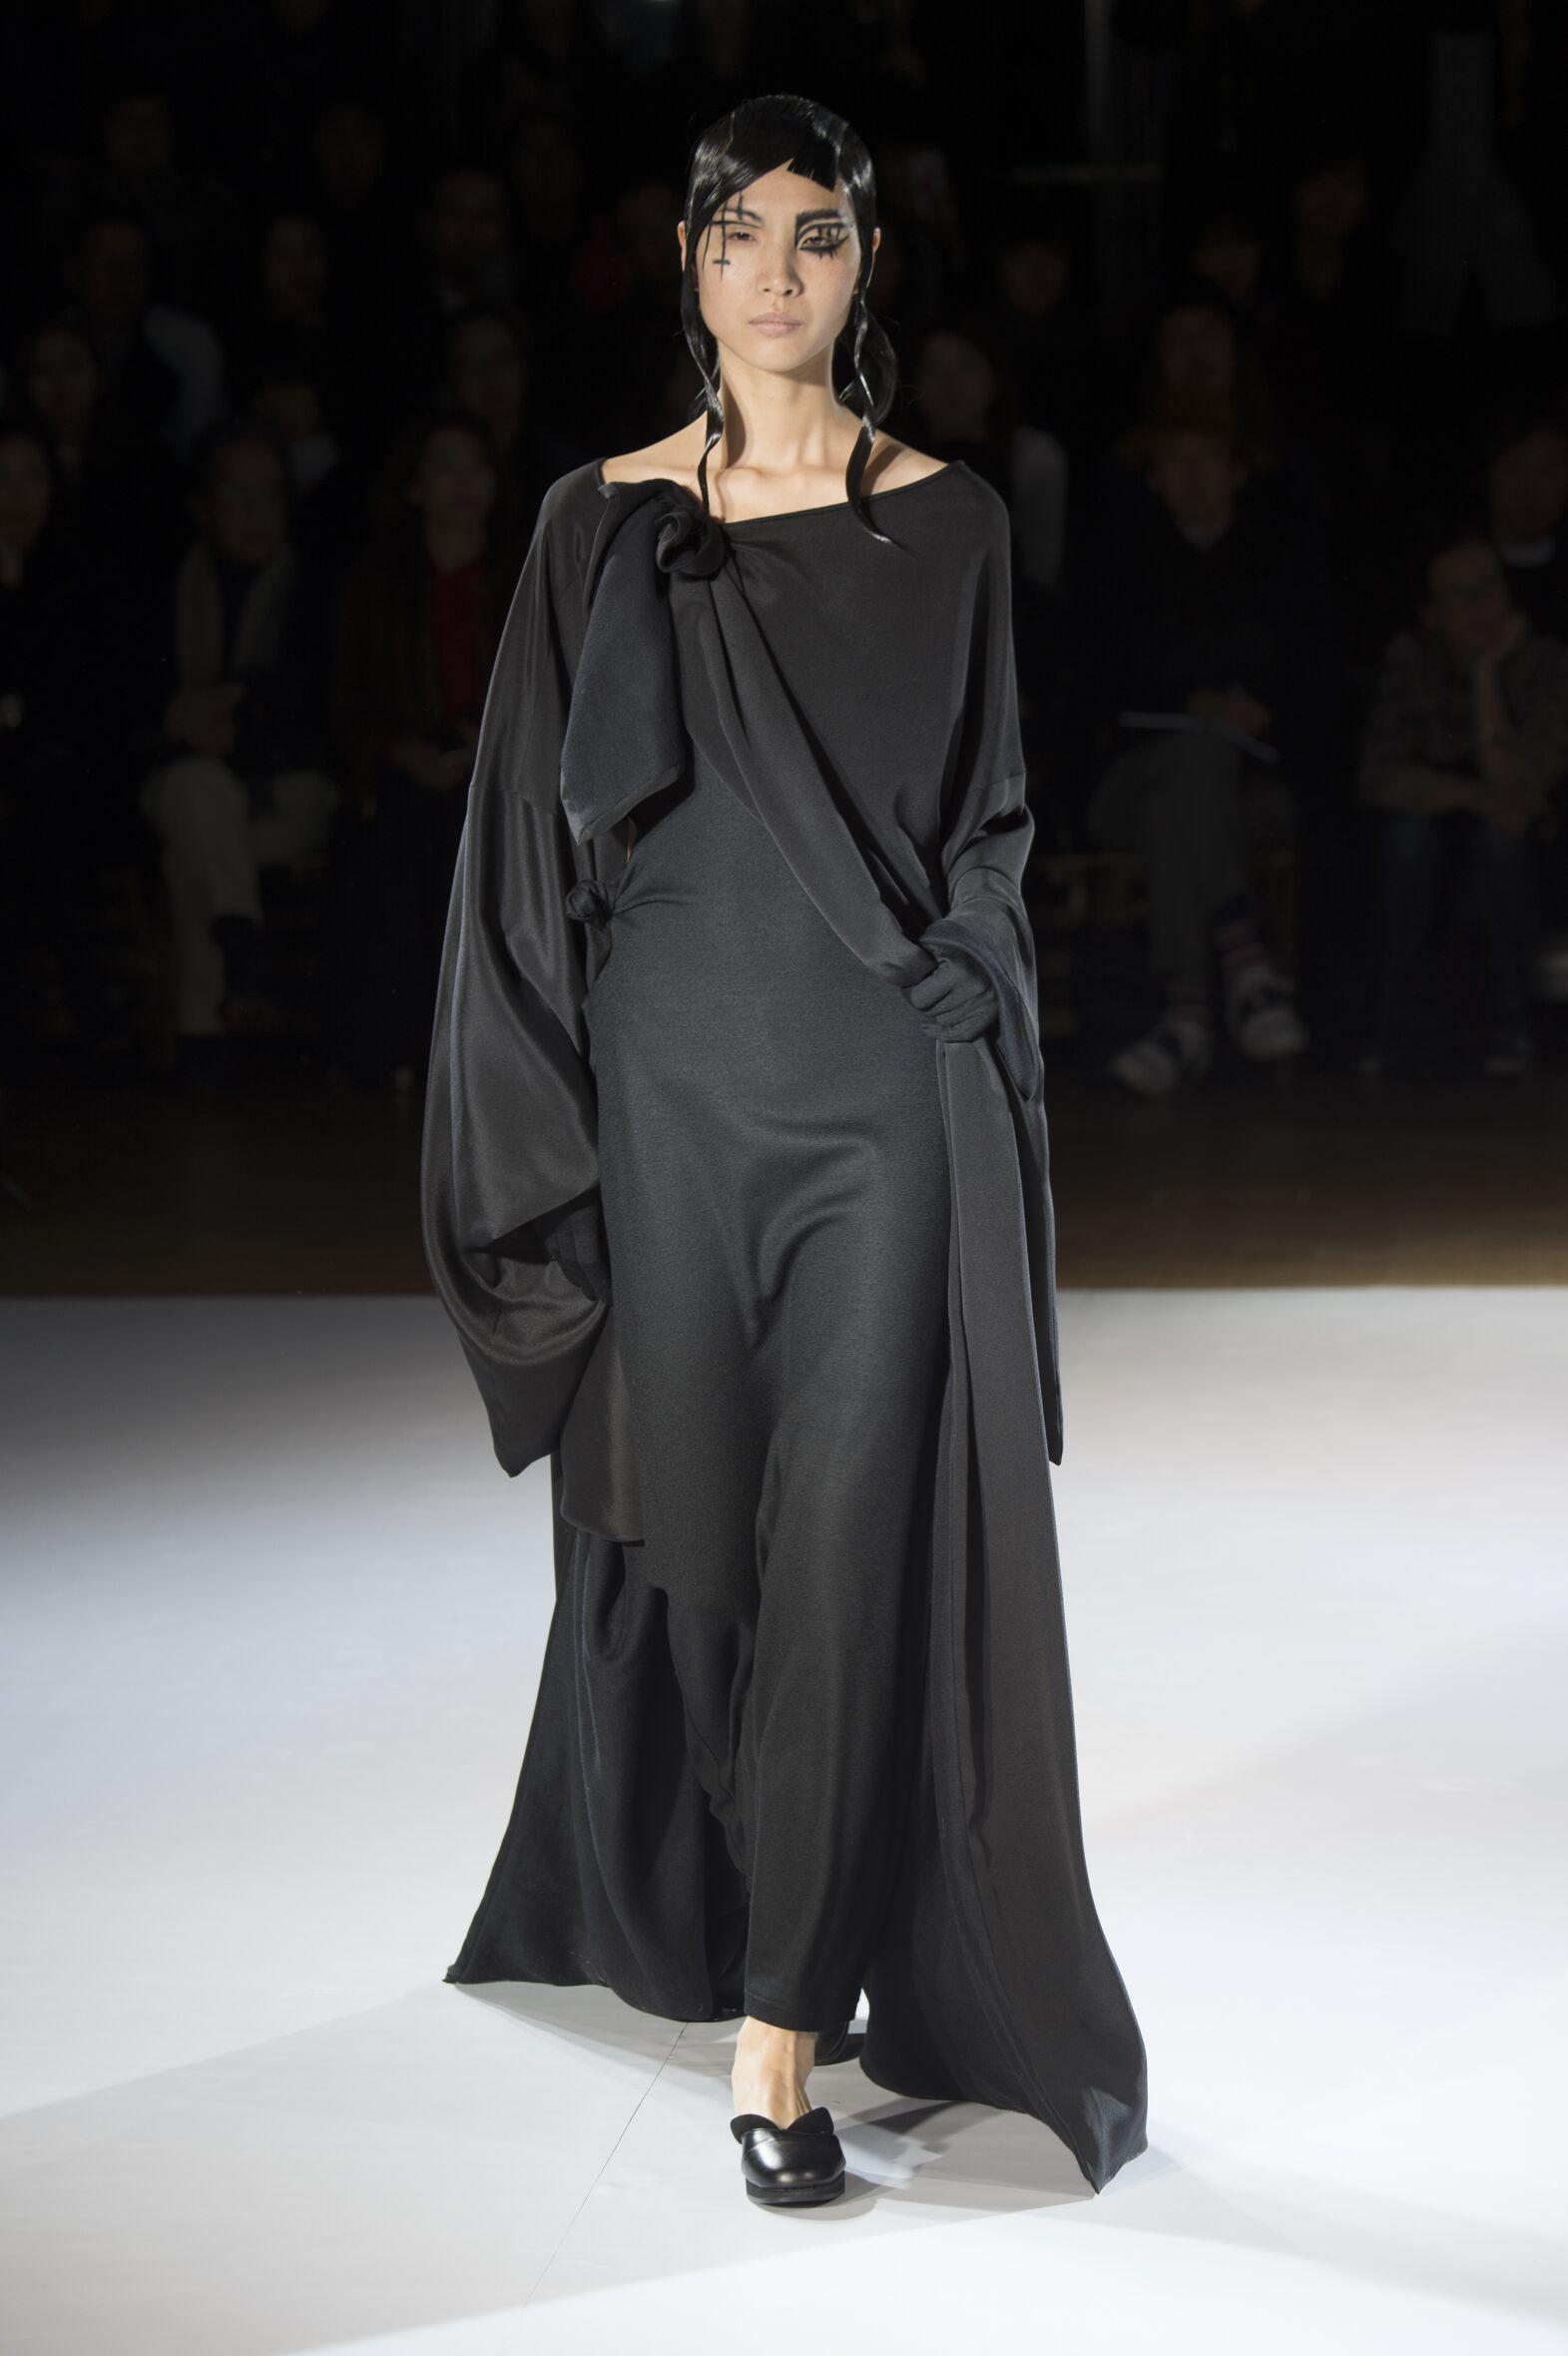 Yohji Yamamoto Collection Fashion Show FW 2015 2016